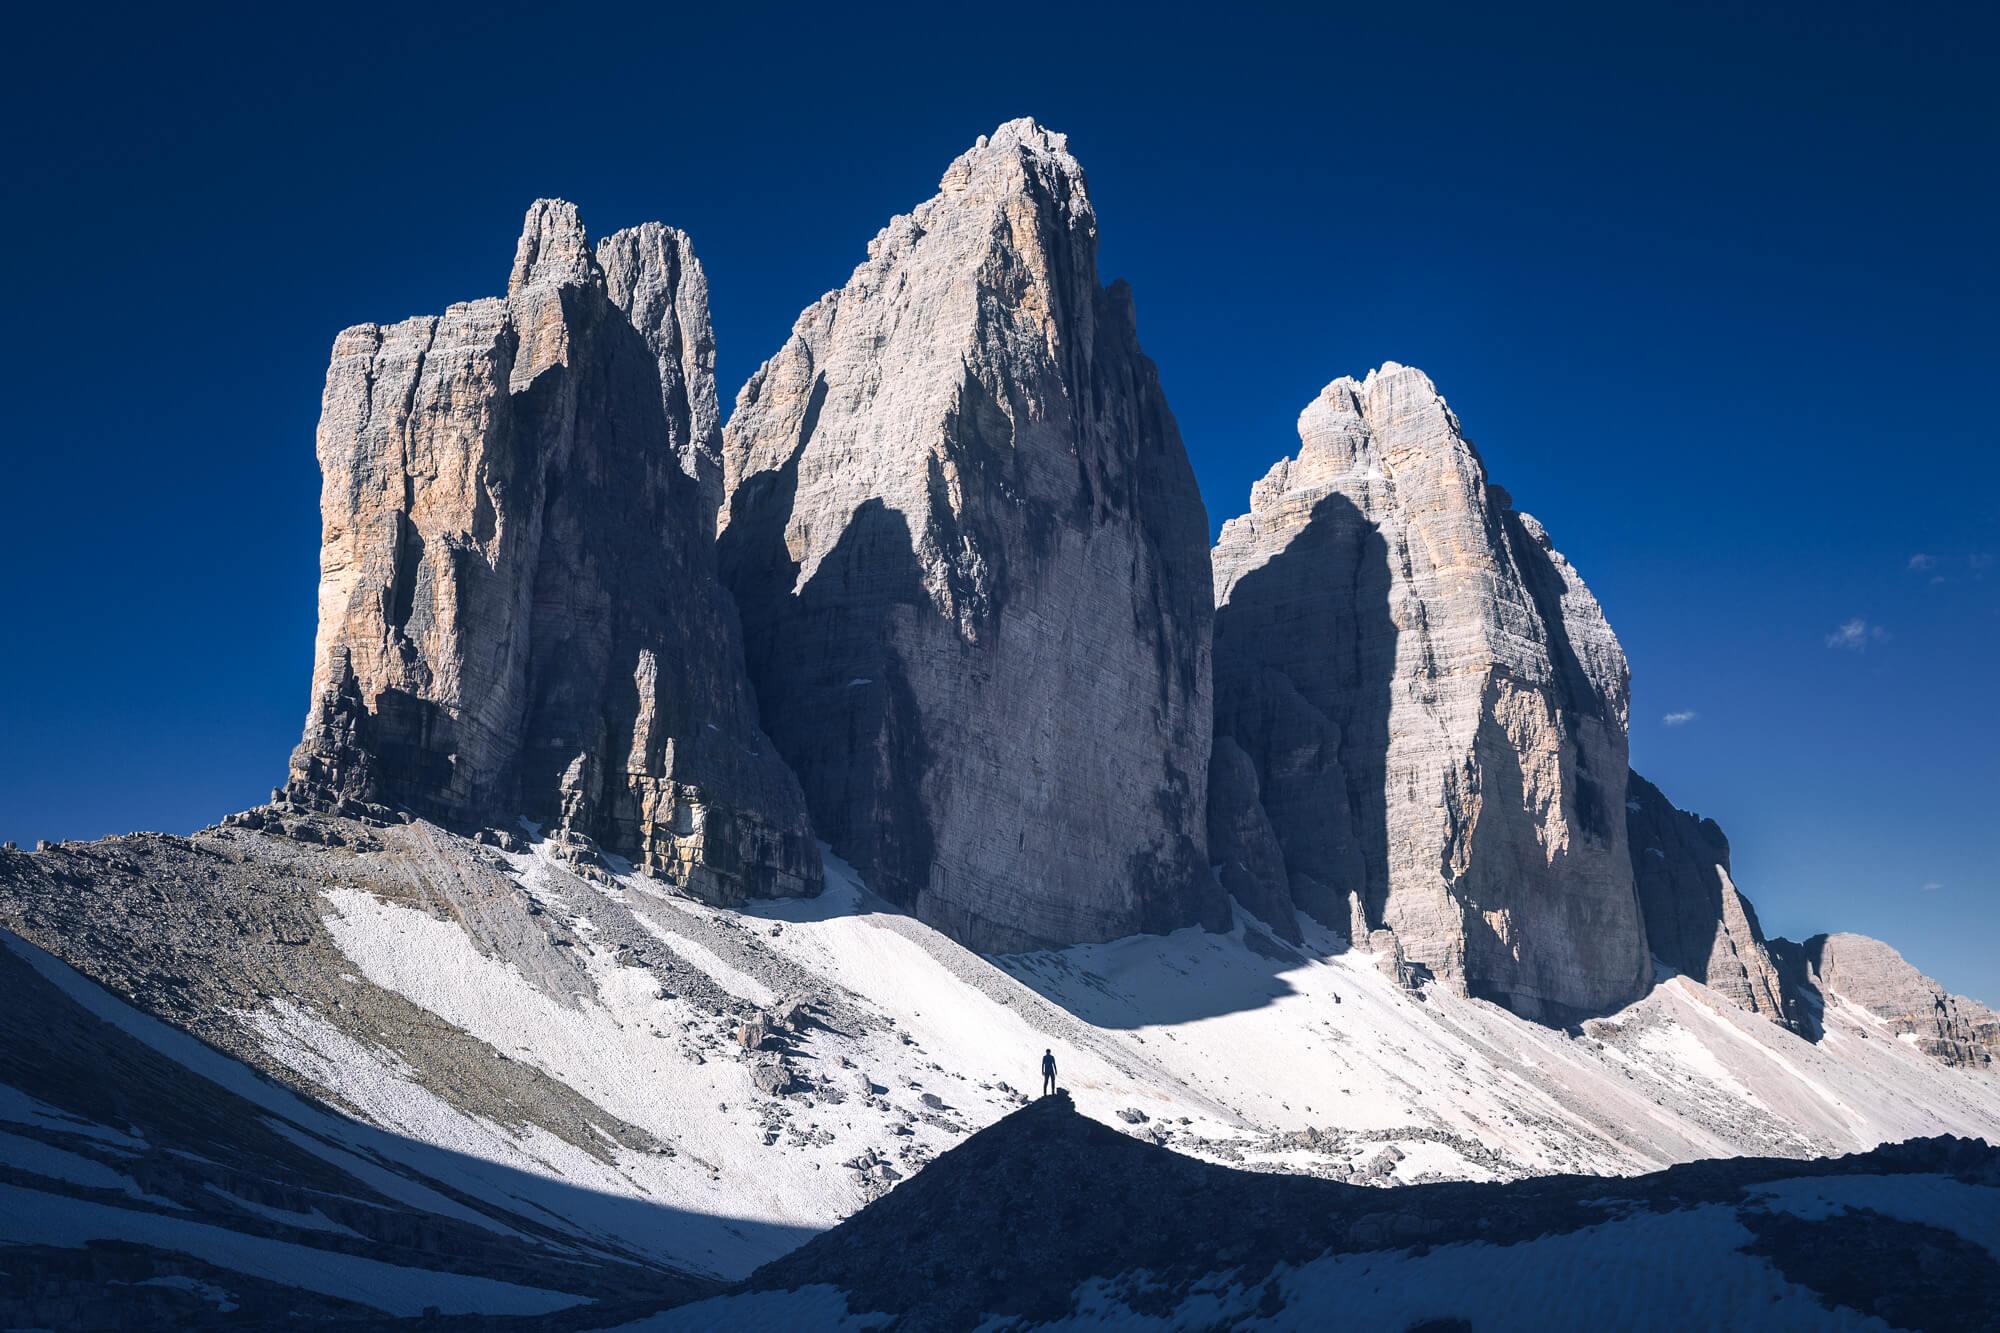 Tre Cime di Lavaredo in the Dolomiti